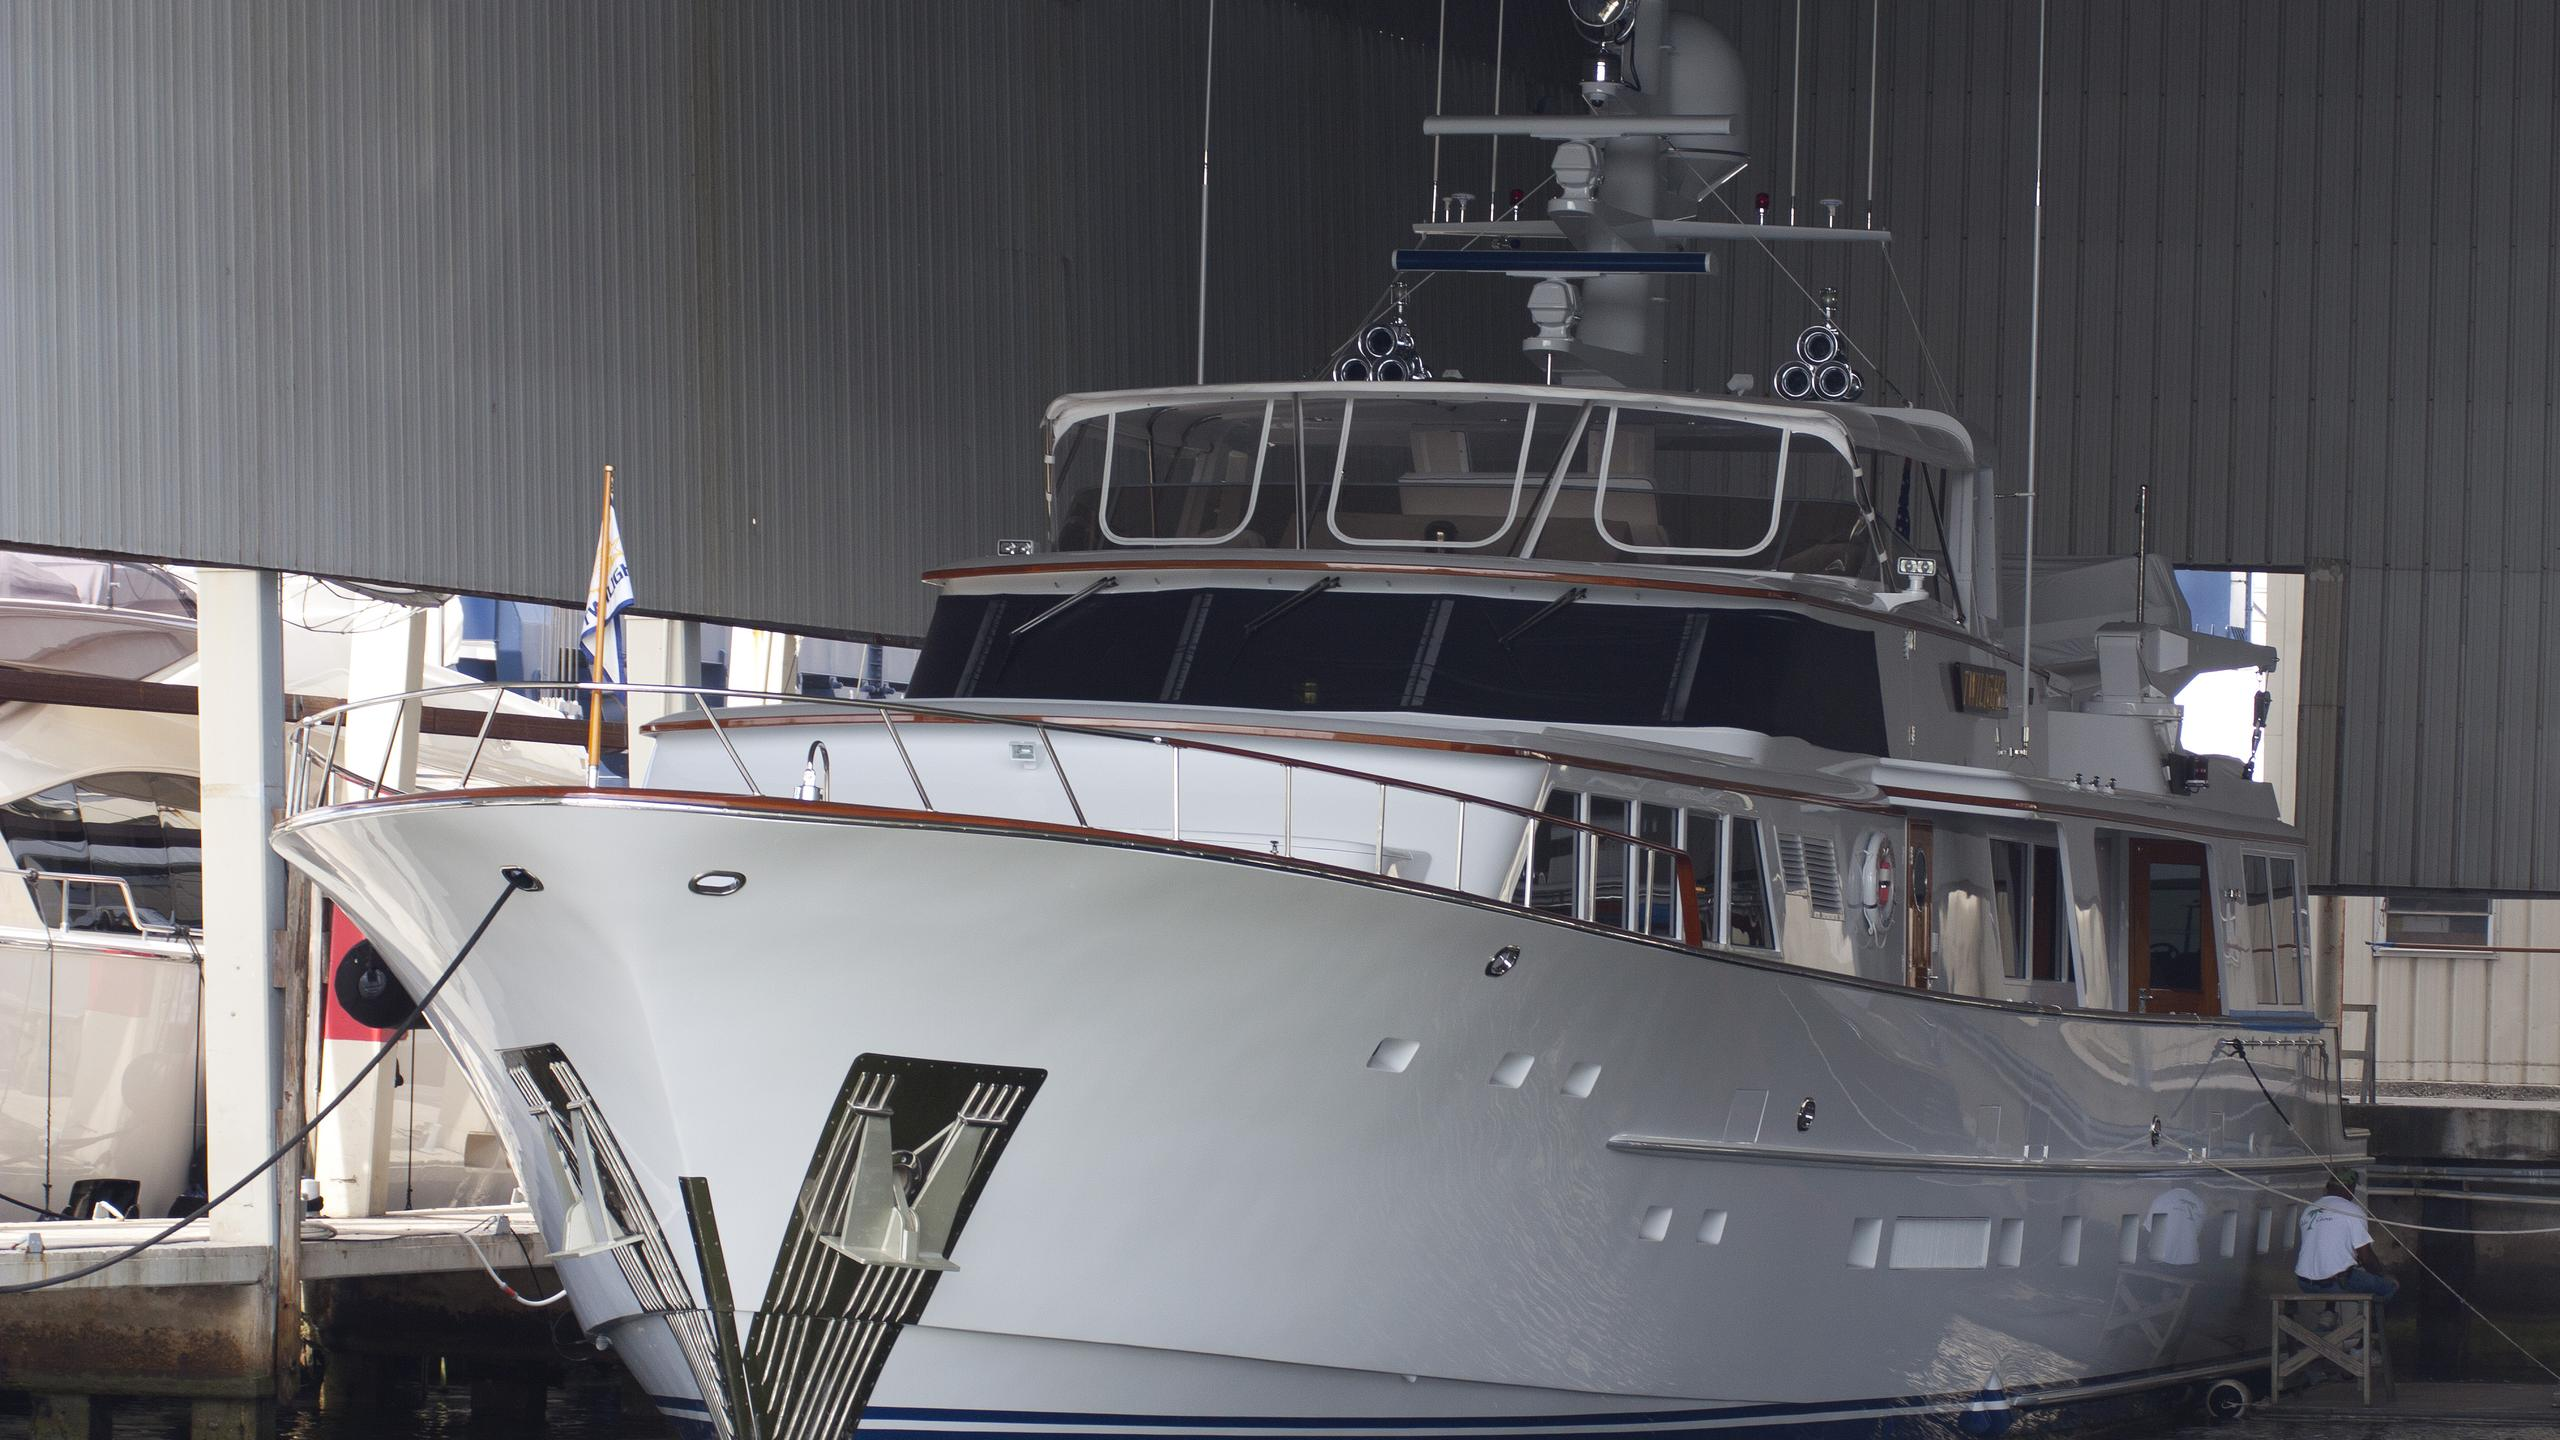 inevitable twilight motoryacht burger boat 36m 1994 bow